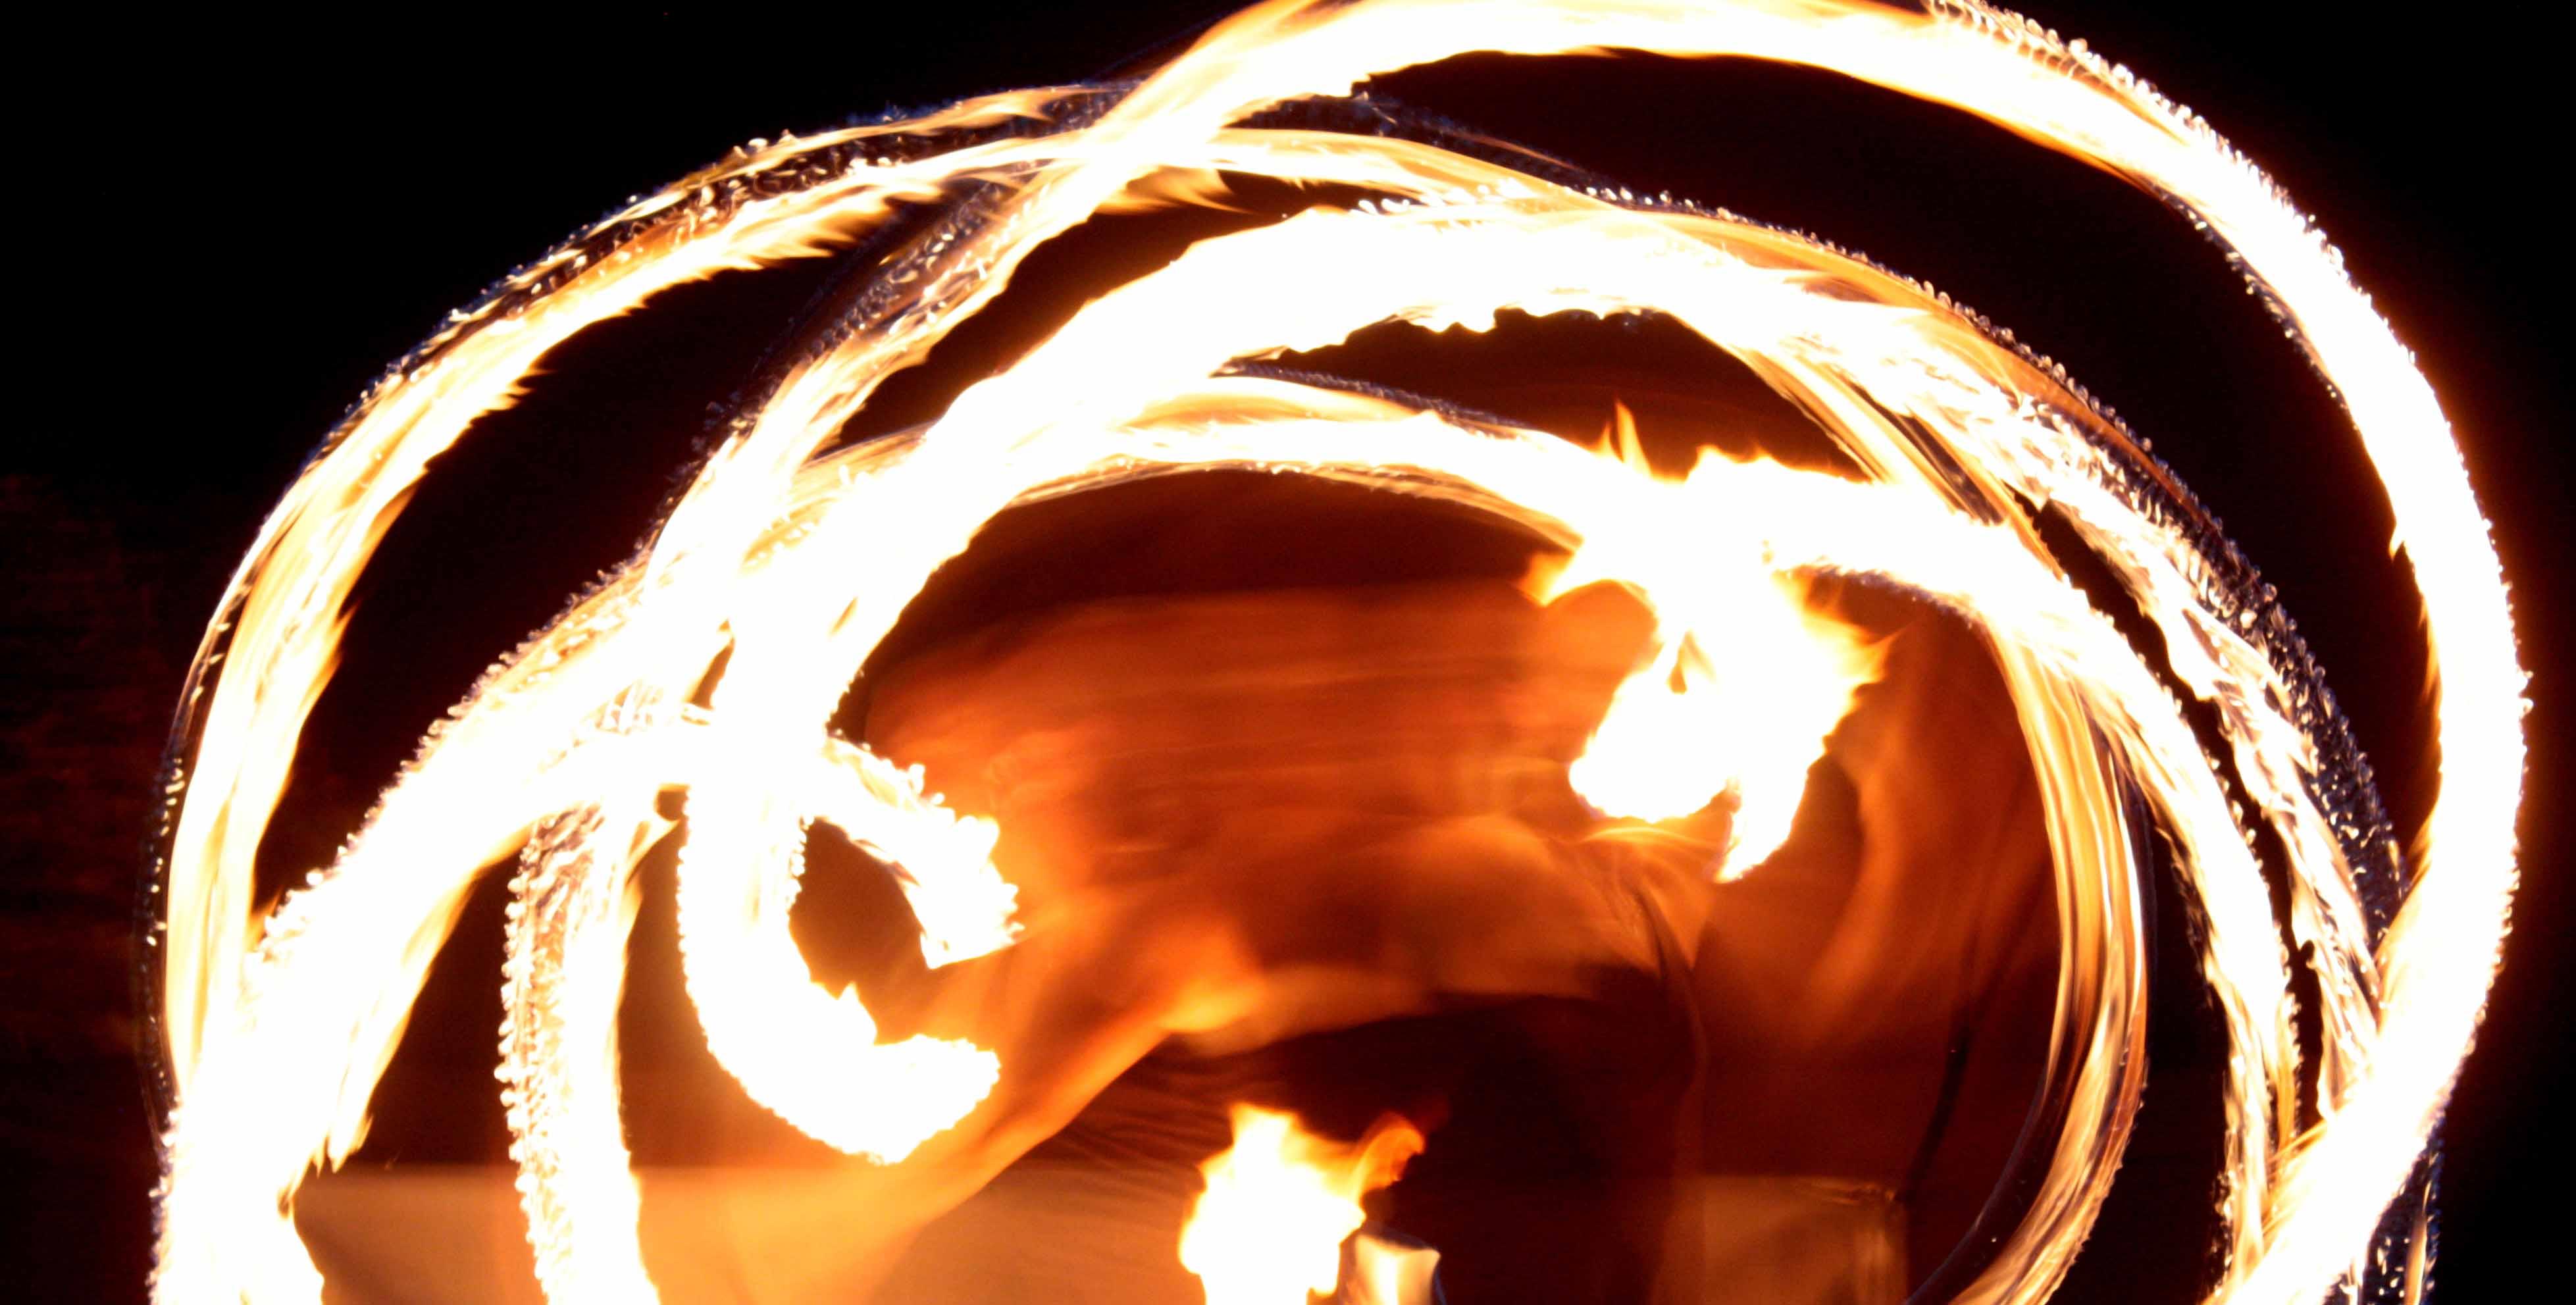 Feuer|Geburtstag